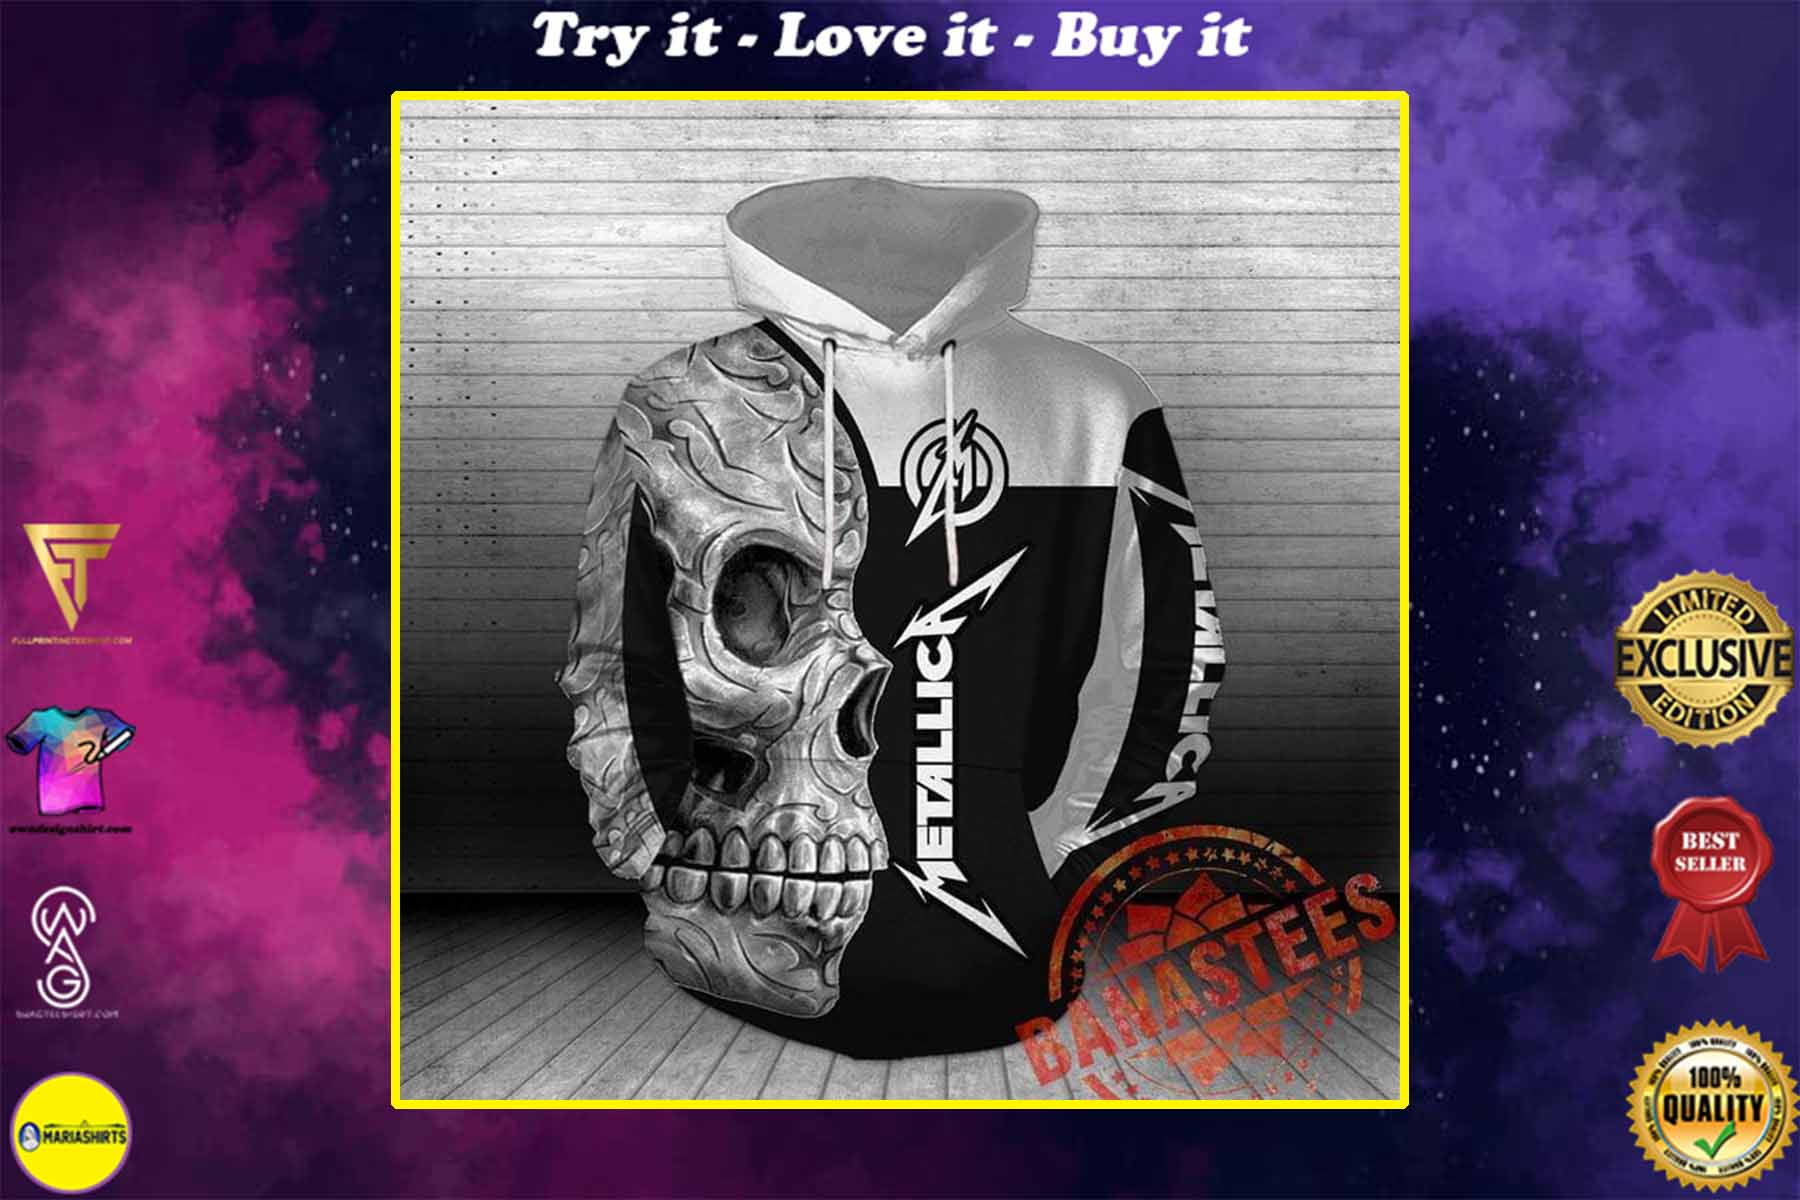 [special edition] sugar skull metallica rock band full over printed shirt - maria